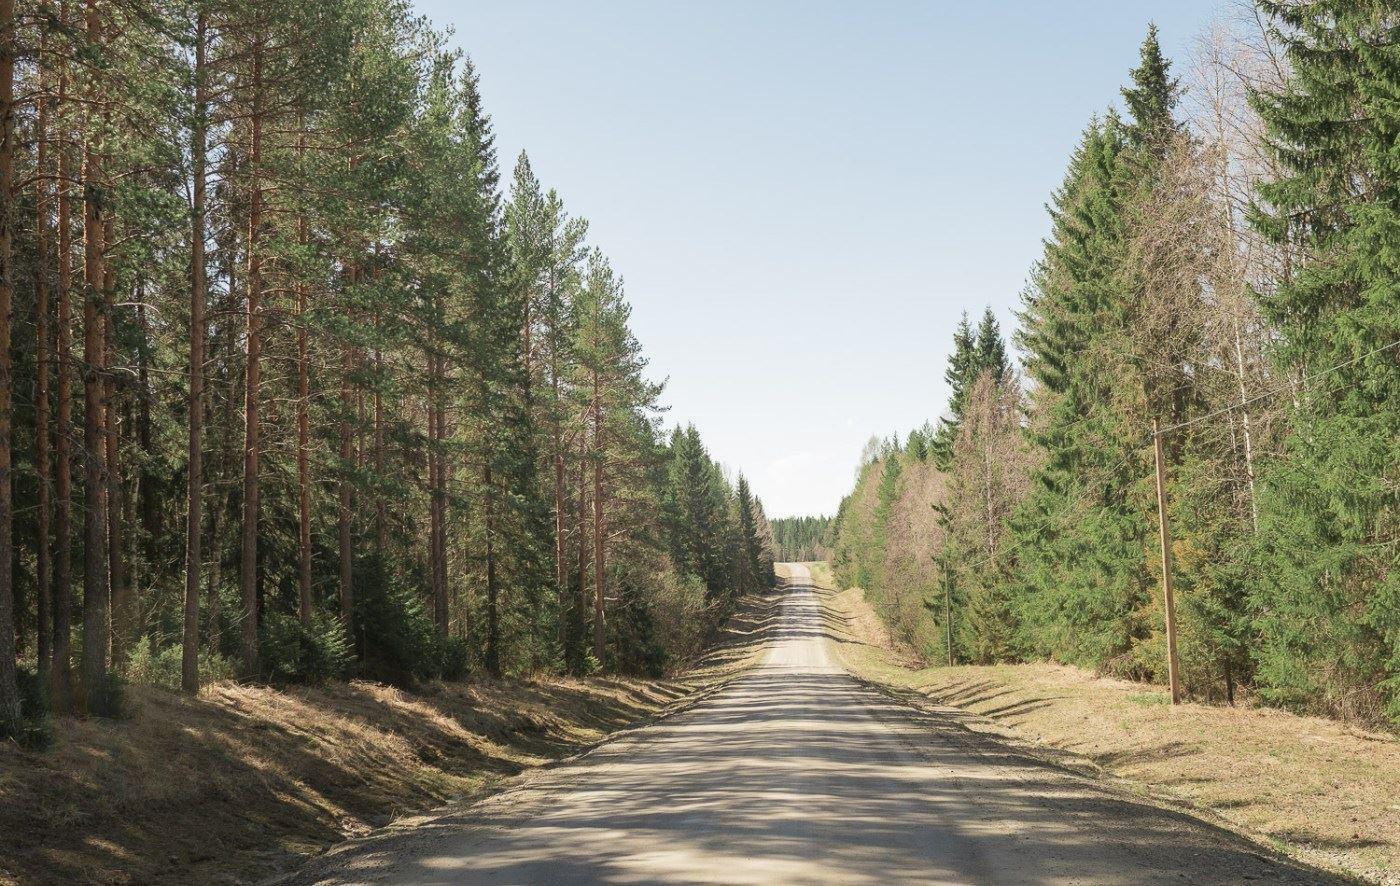 cykelintresset.se, Glassbonden Gravel Challenge